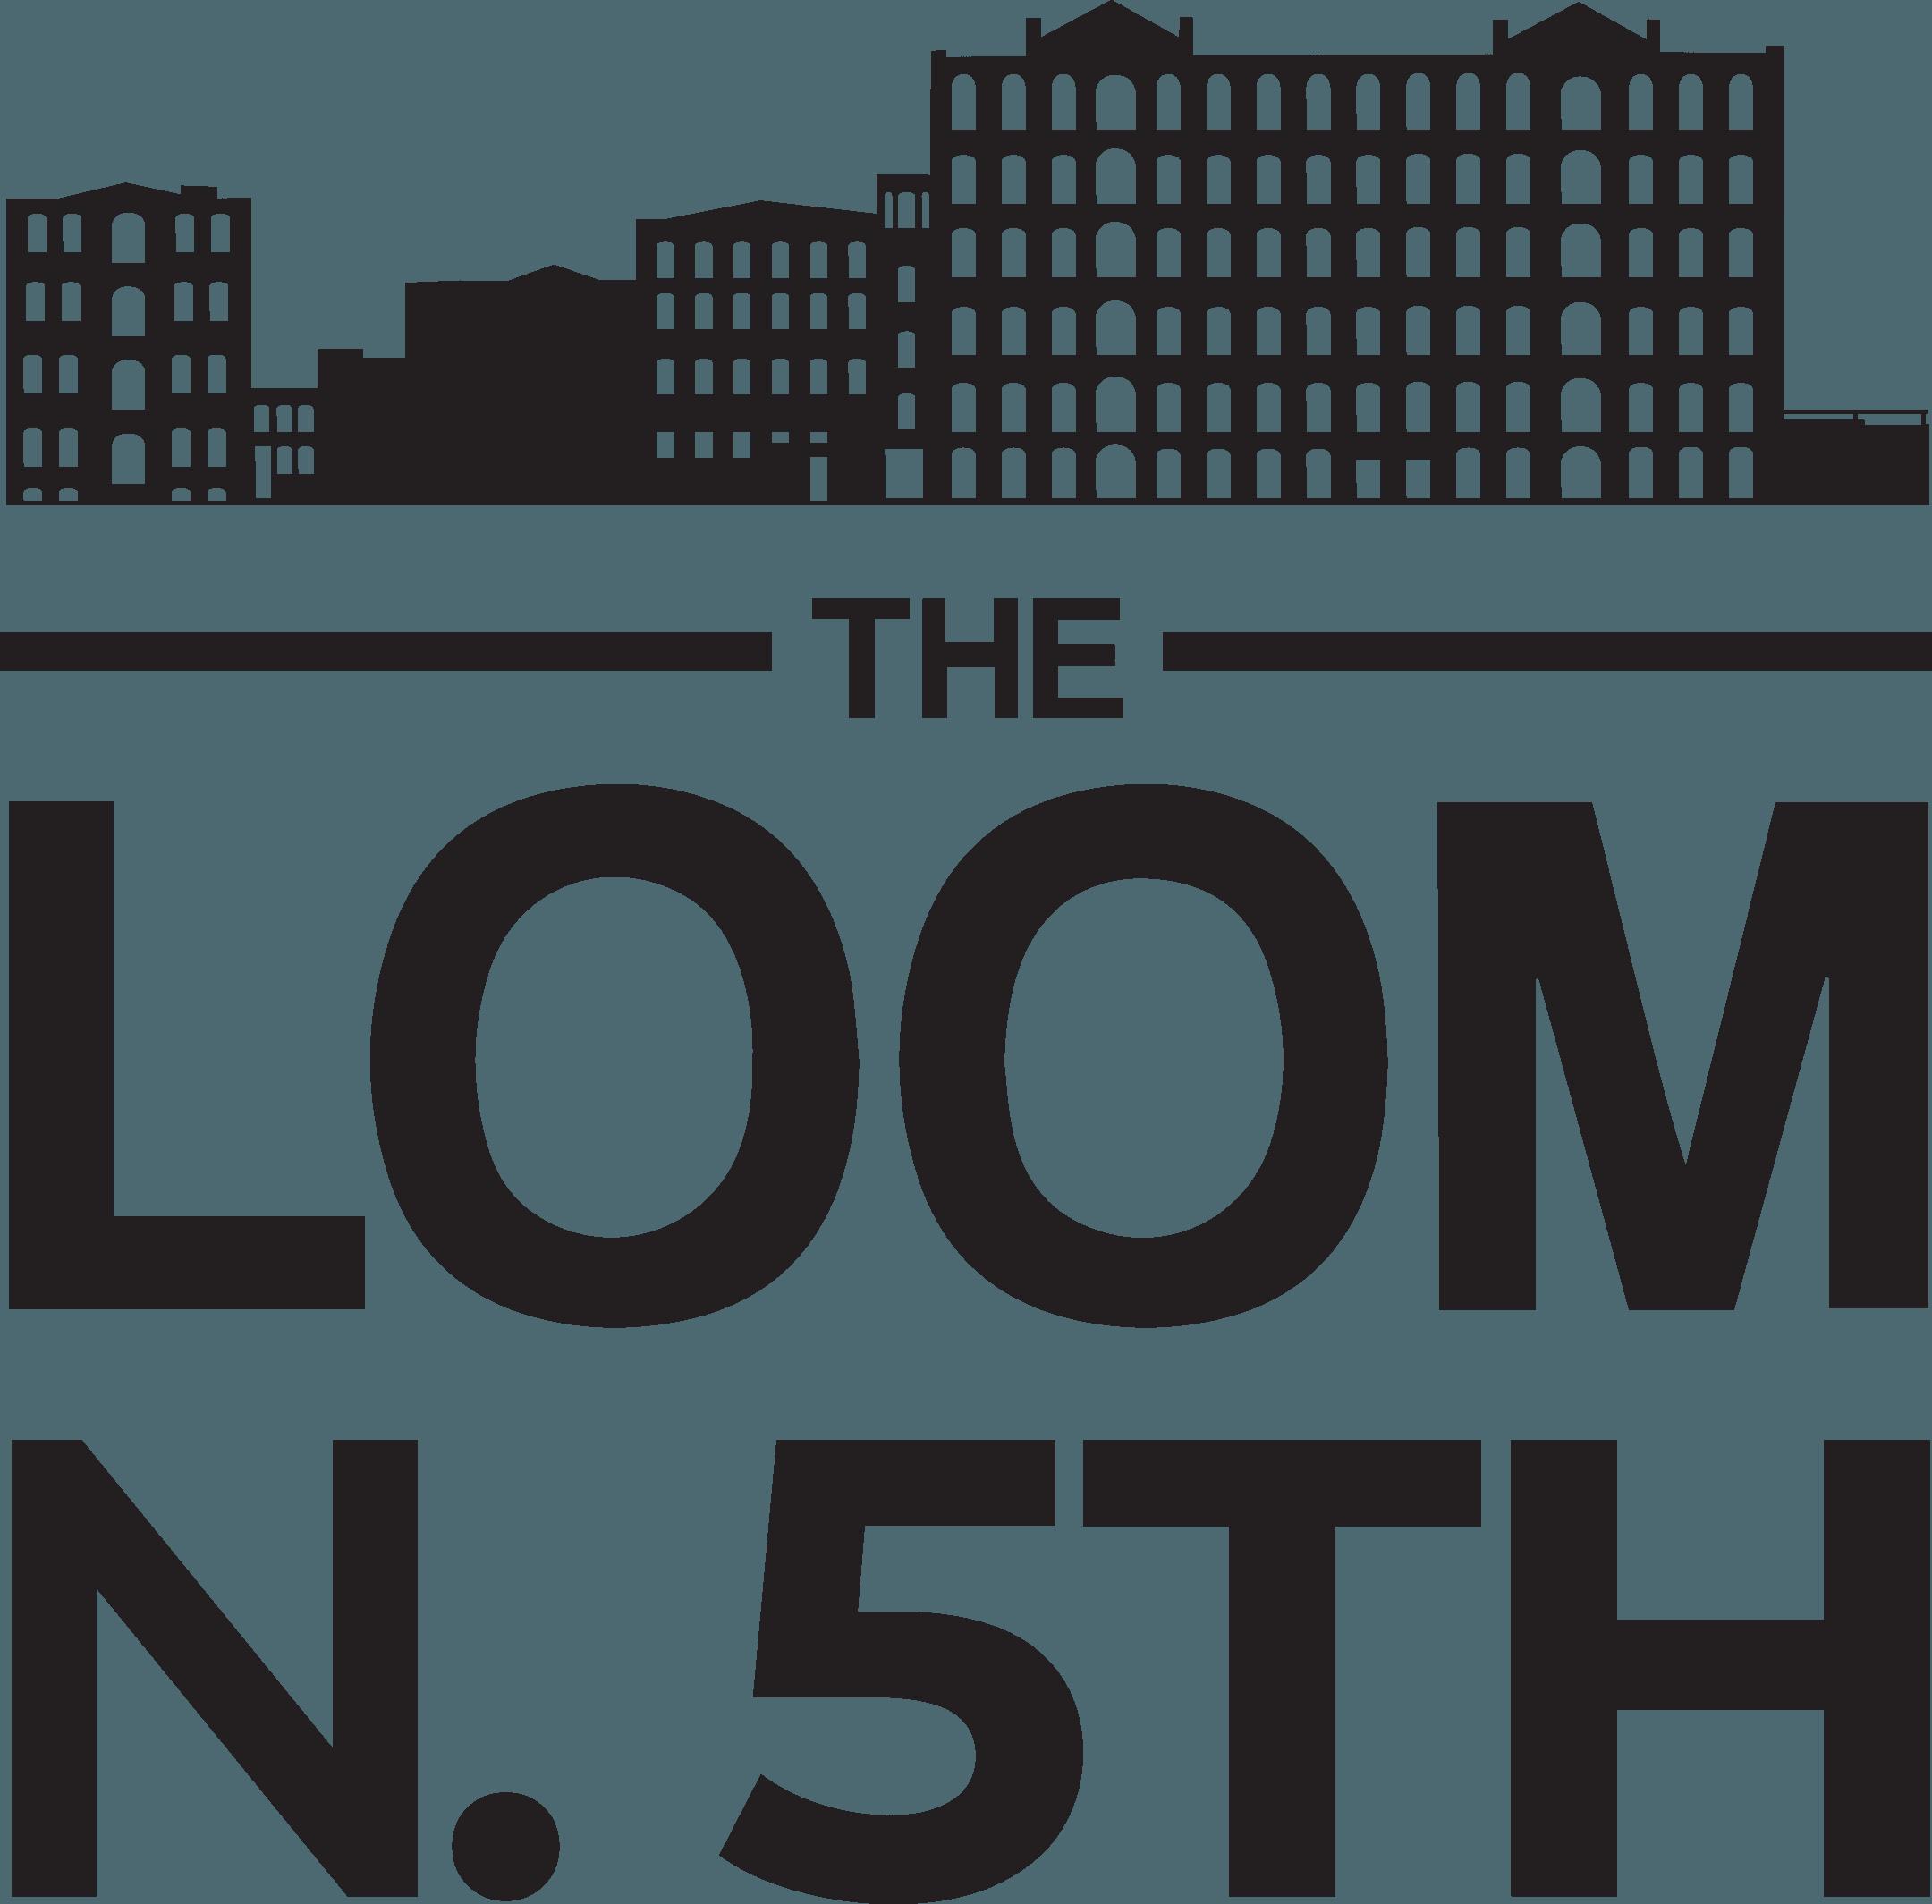 The Loom N. 5th